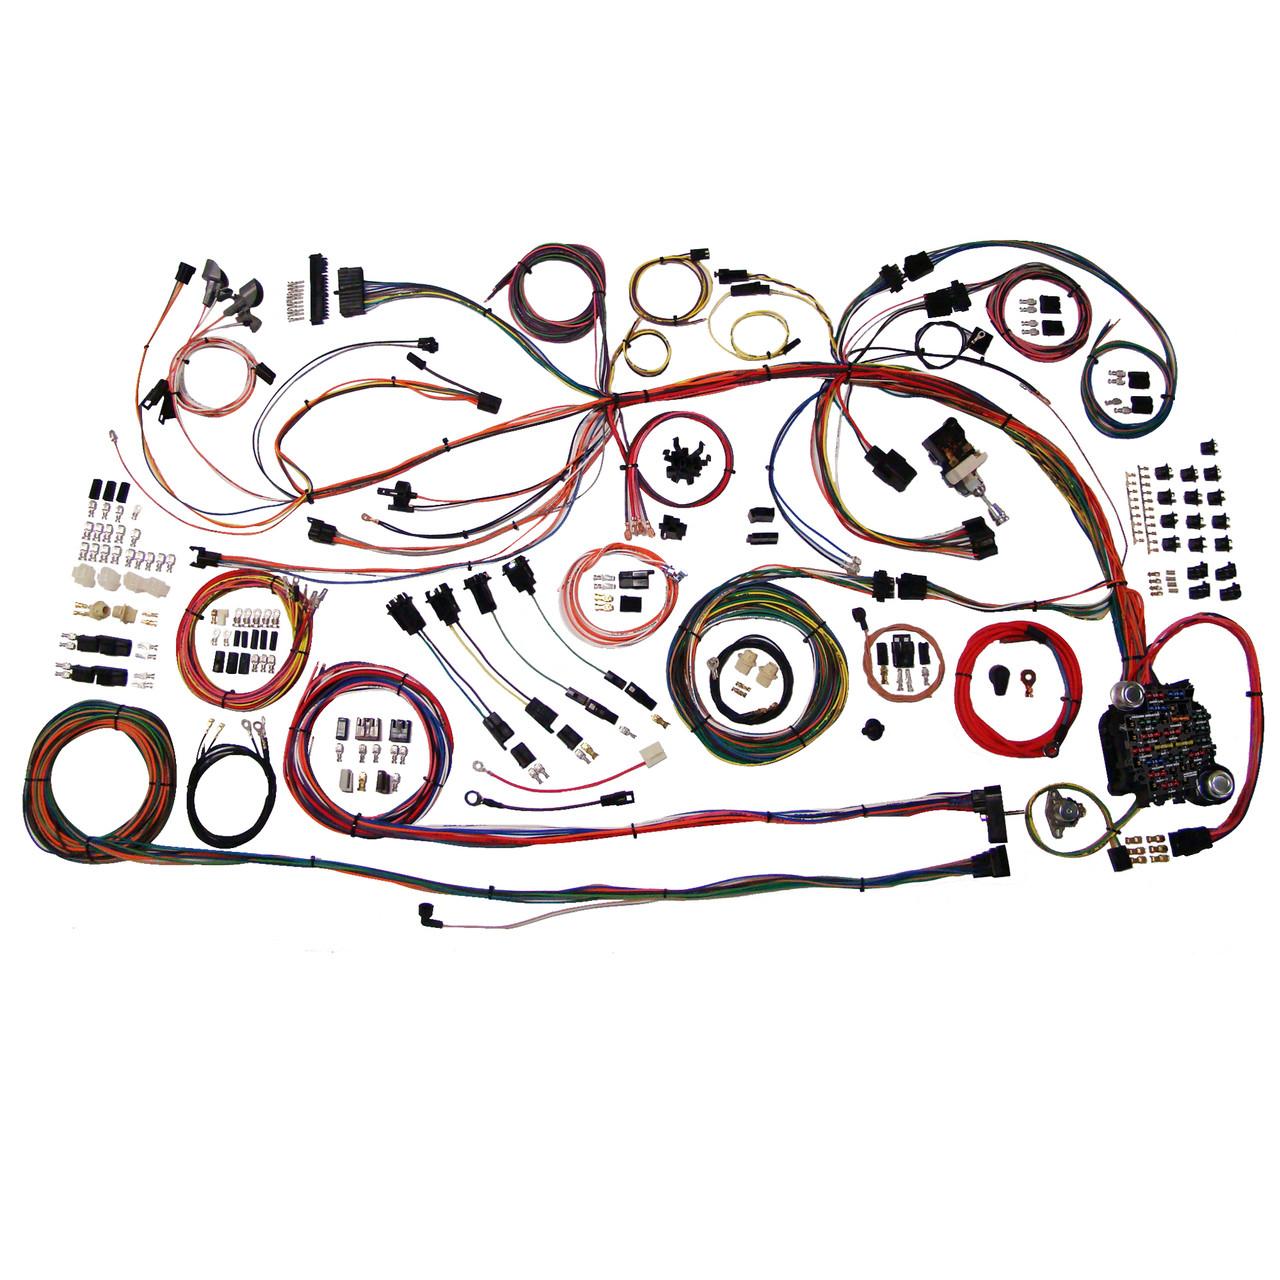 hight resolution of wiring harness 1964 el camino wiring diagram centre 1966 el camino wiring harness